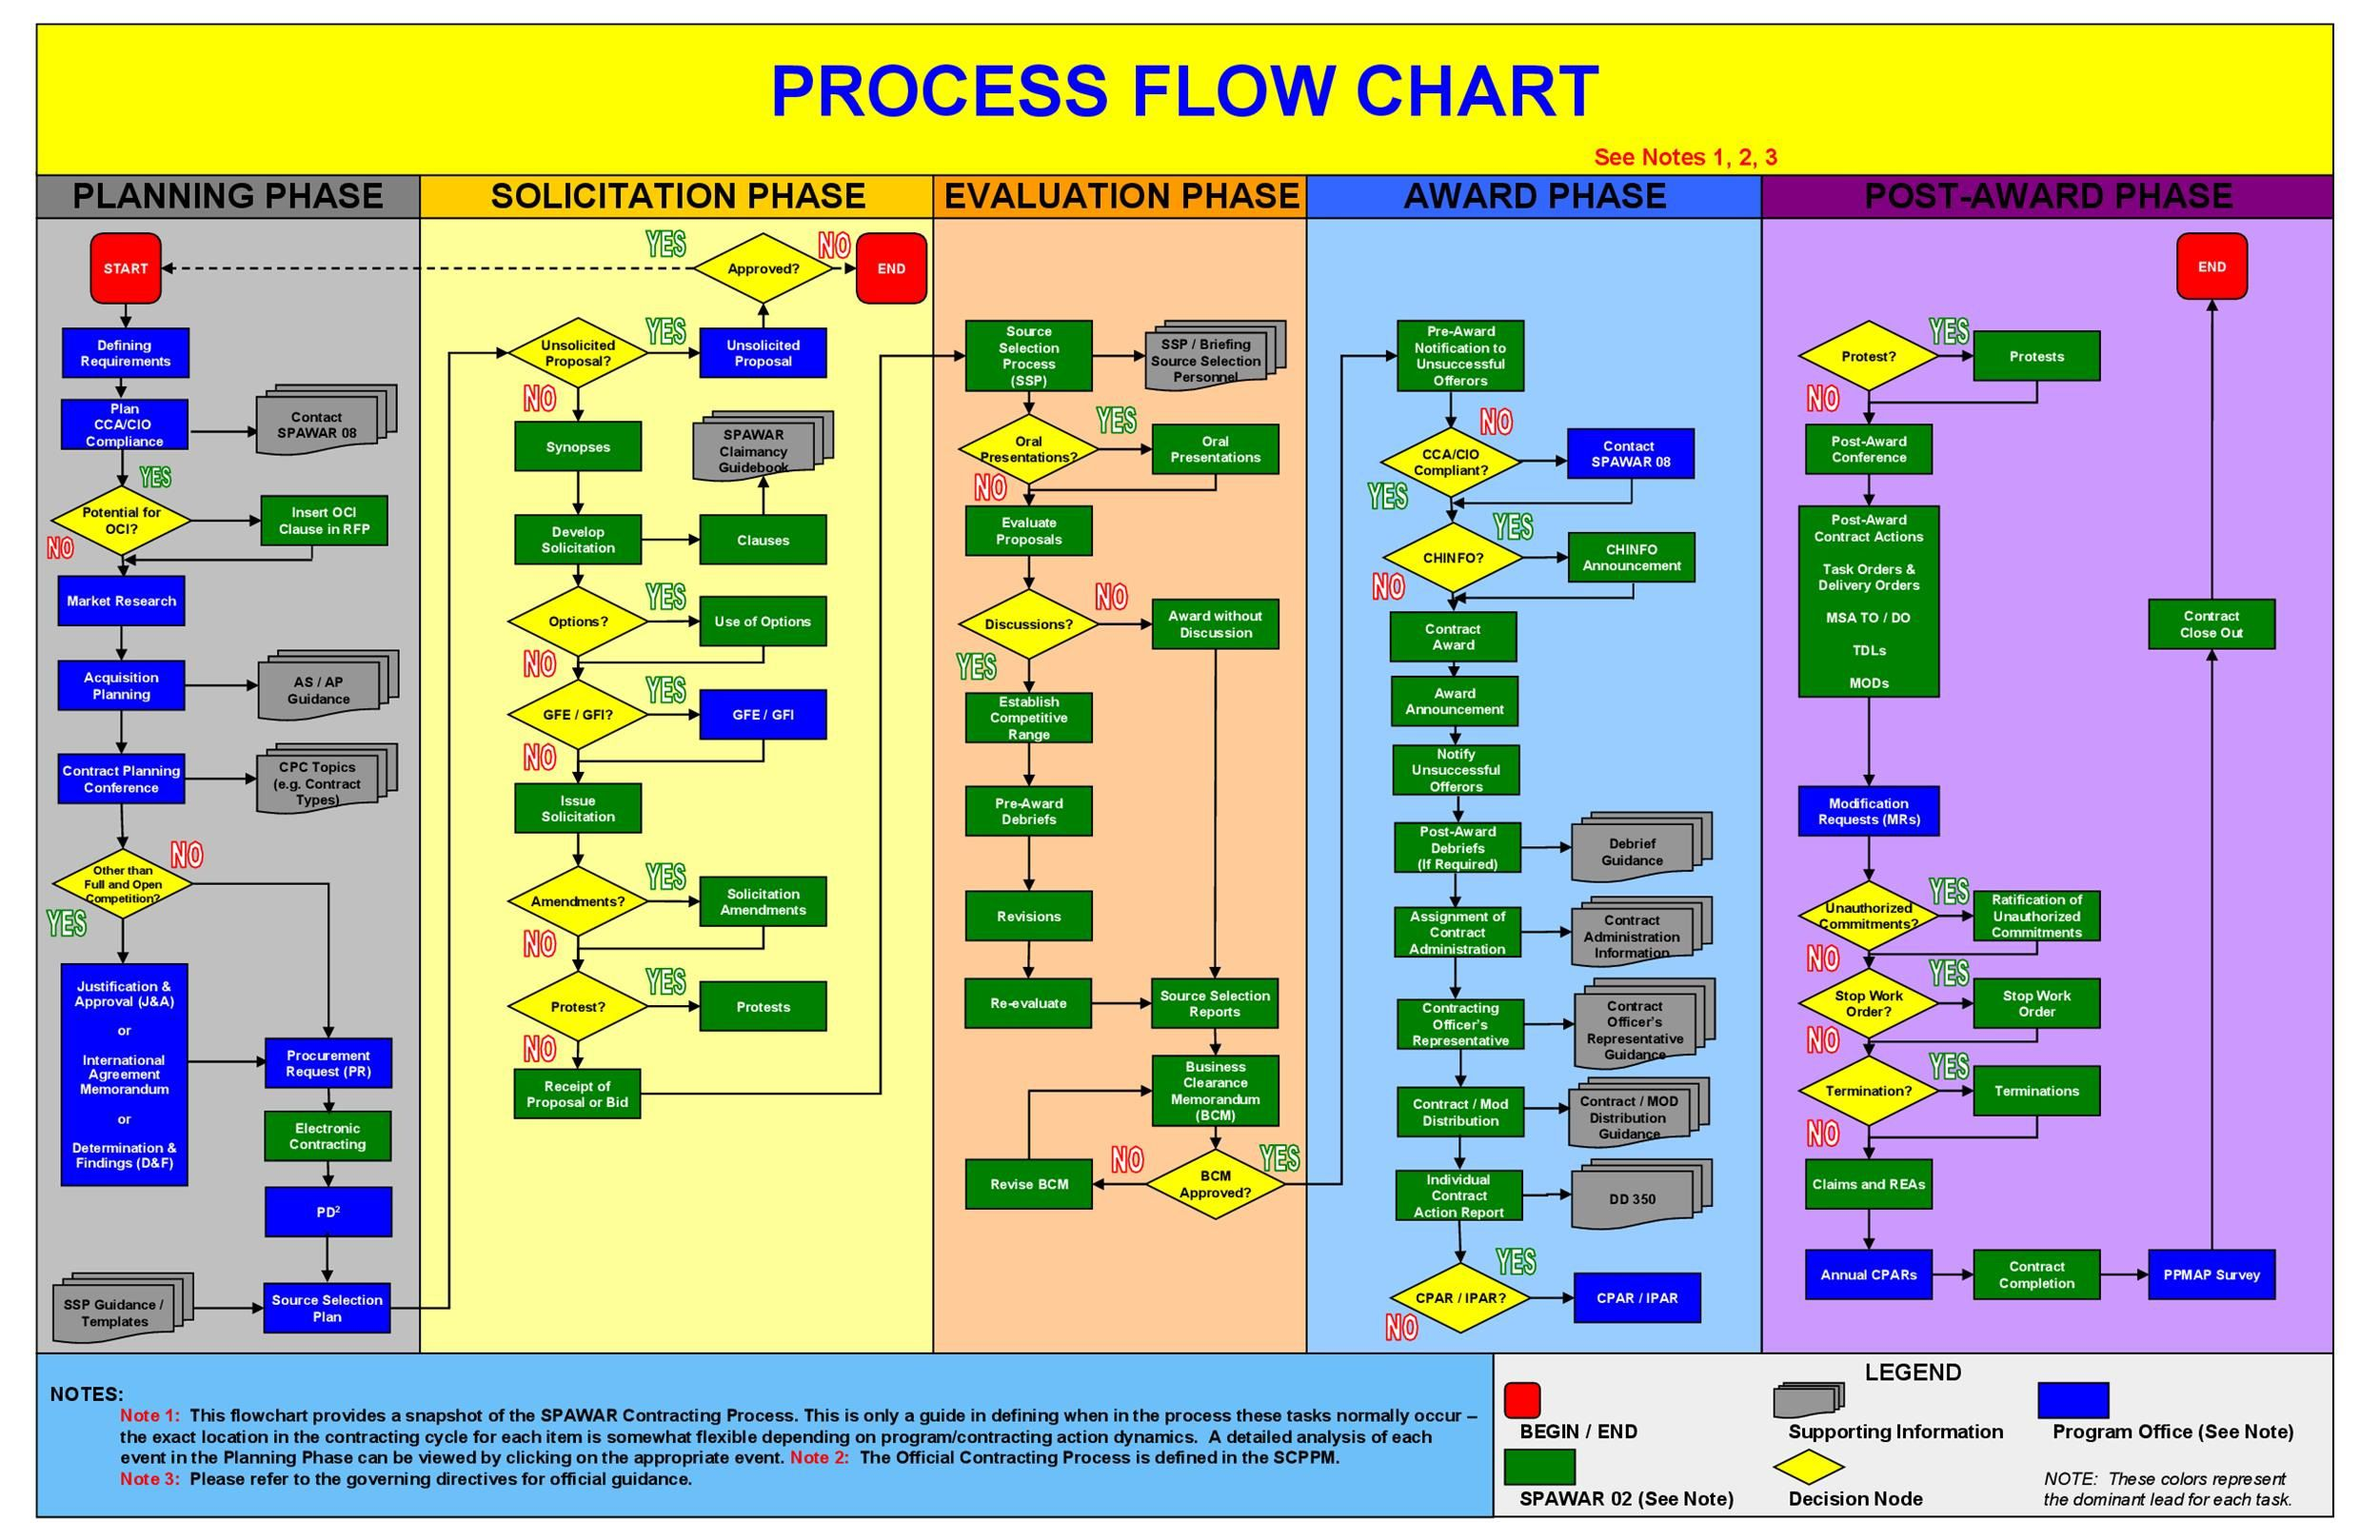 005 Fascinating Free Flowchart Template Excel 2010 Design Full